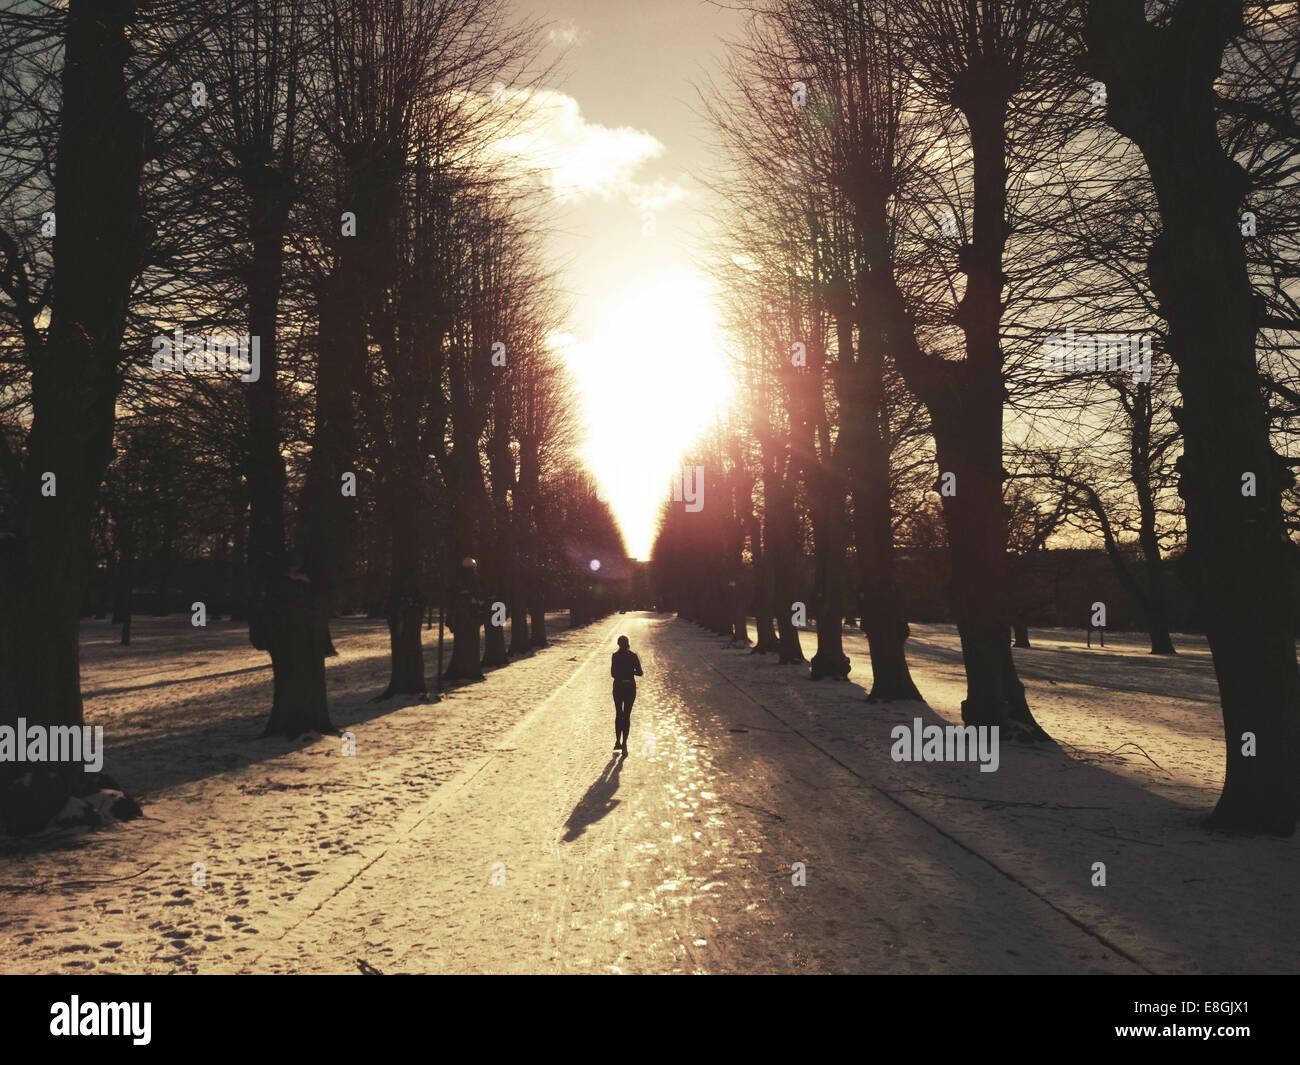 Silhouette of a Man running in Sondermarken, Frederiksberg, Copenhagen, Denmark - Stock Image